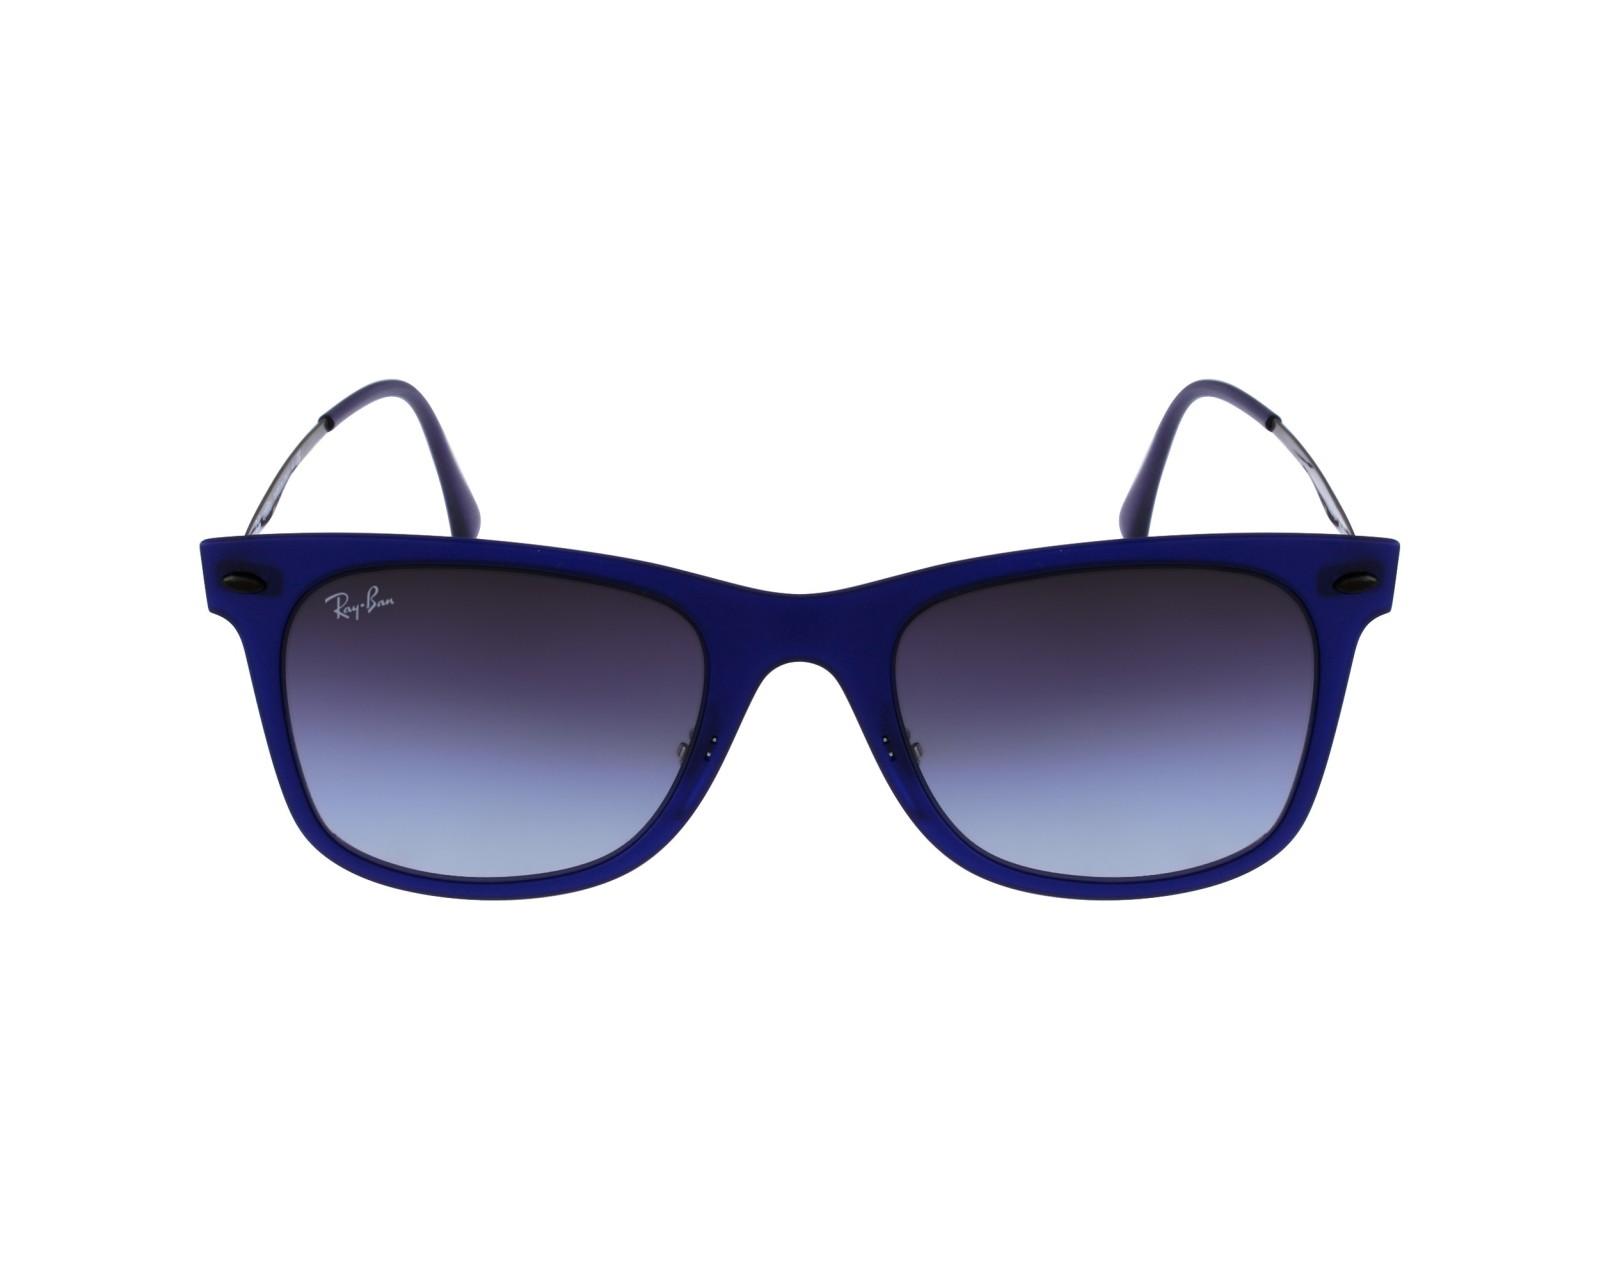 d2ed3e9581a thumbnail Sunglasses Ray-Ban RB-4210 895 8G - Blue Silver profile view